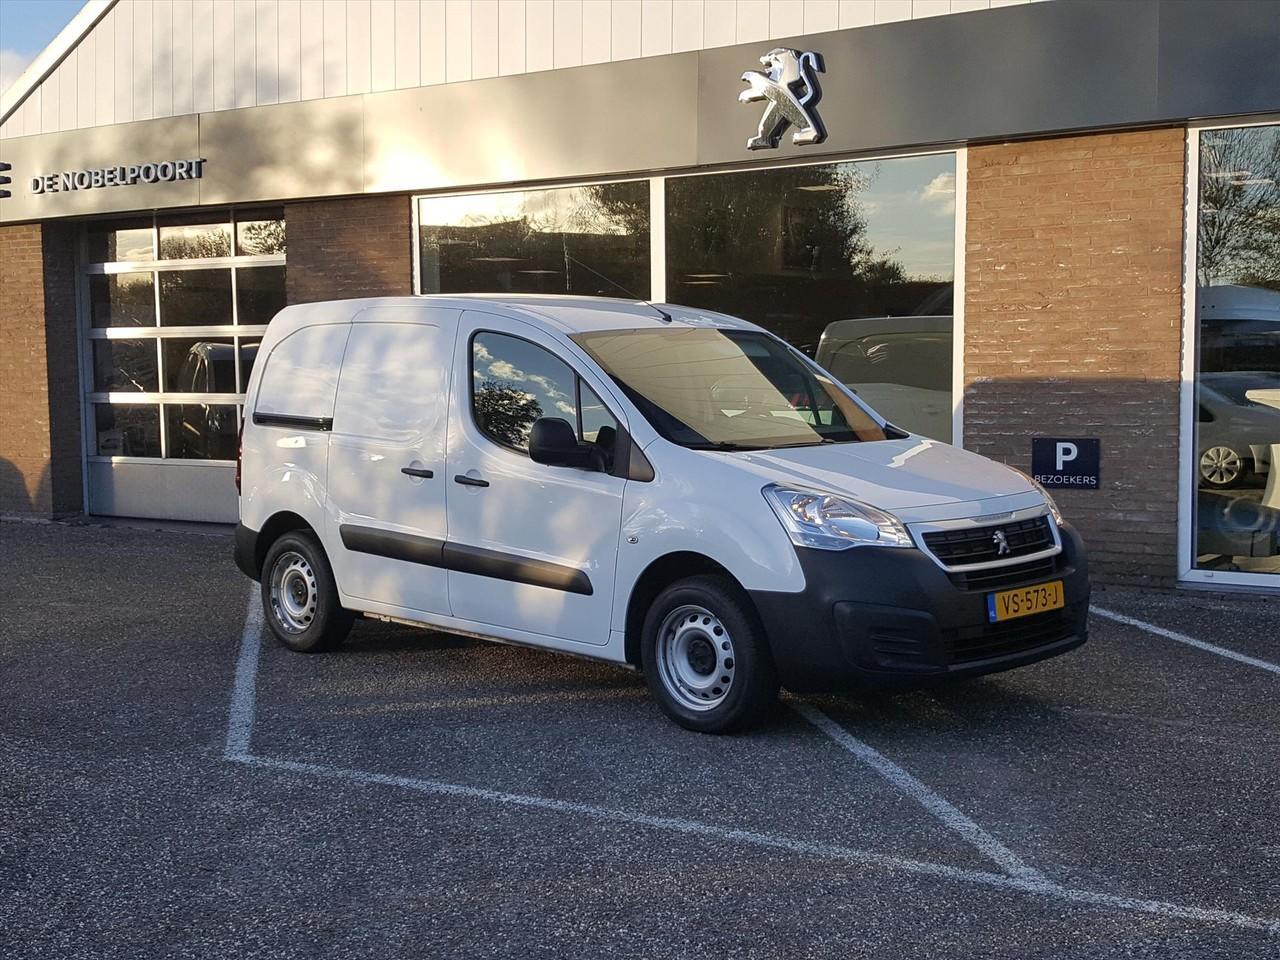 Peugeot Partner Gb 120 l1 xt 1.6 hdi-75pk 2-zits airco,cd&betimmering